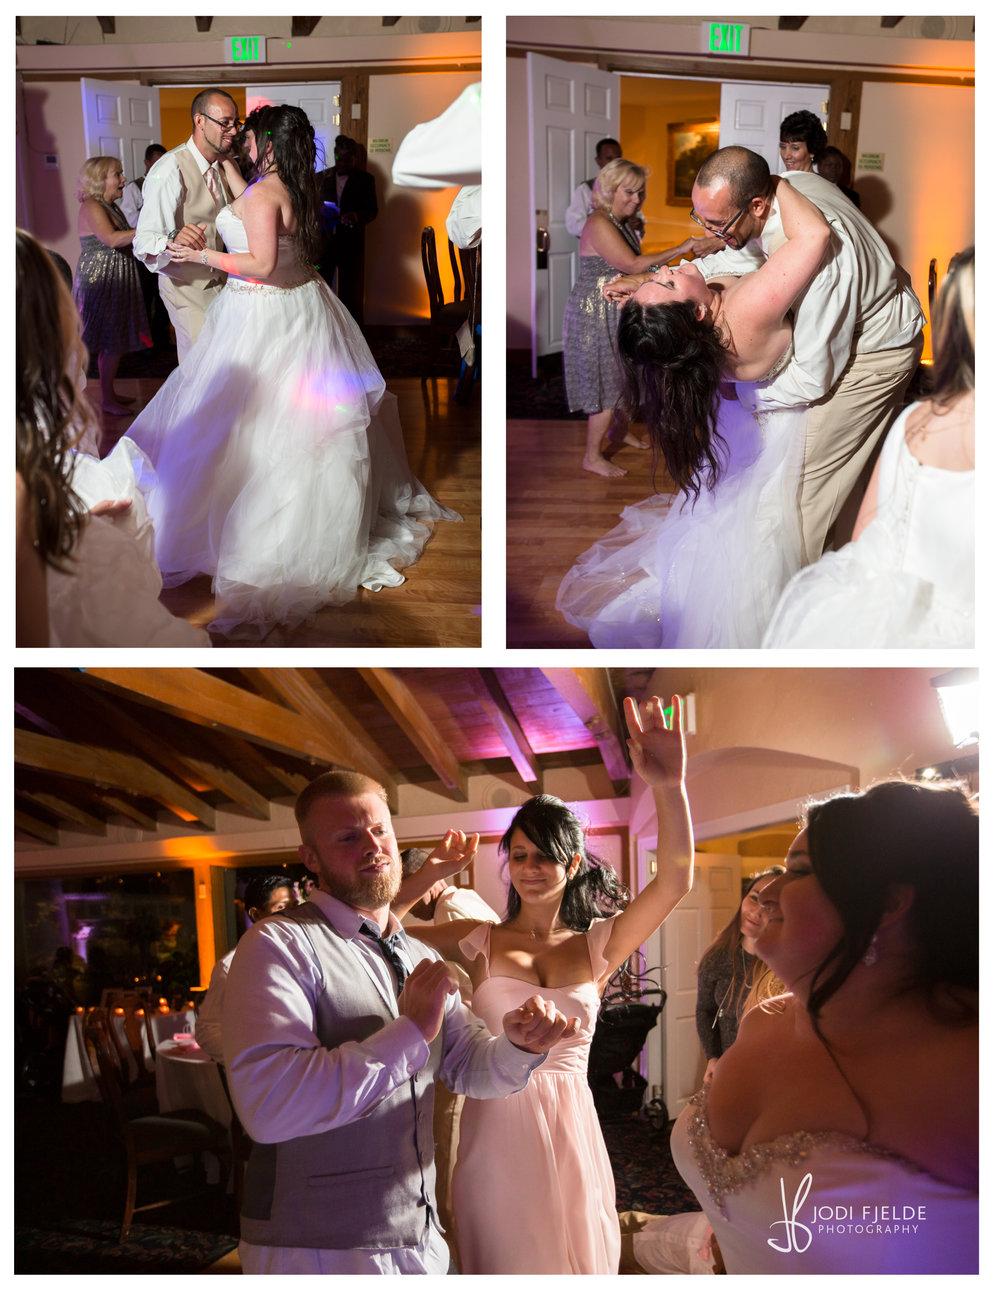 Benvenuto_Boynton Beach_ Wedding_Emily_&_Shawn 32.jpg